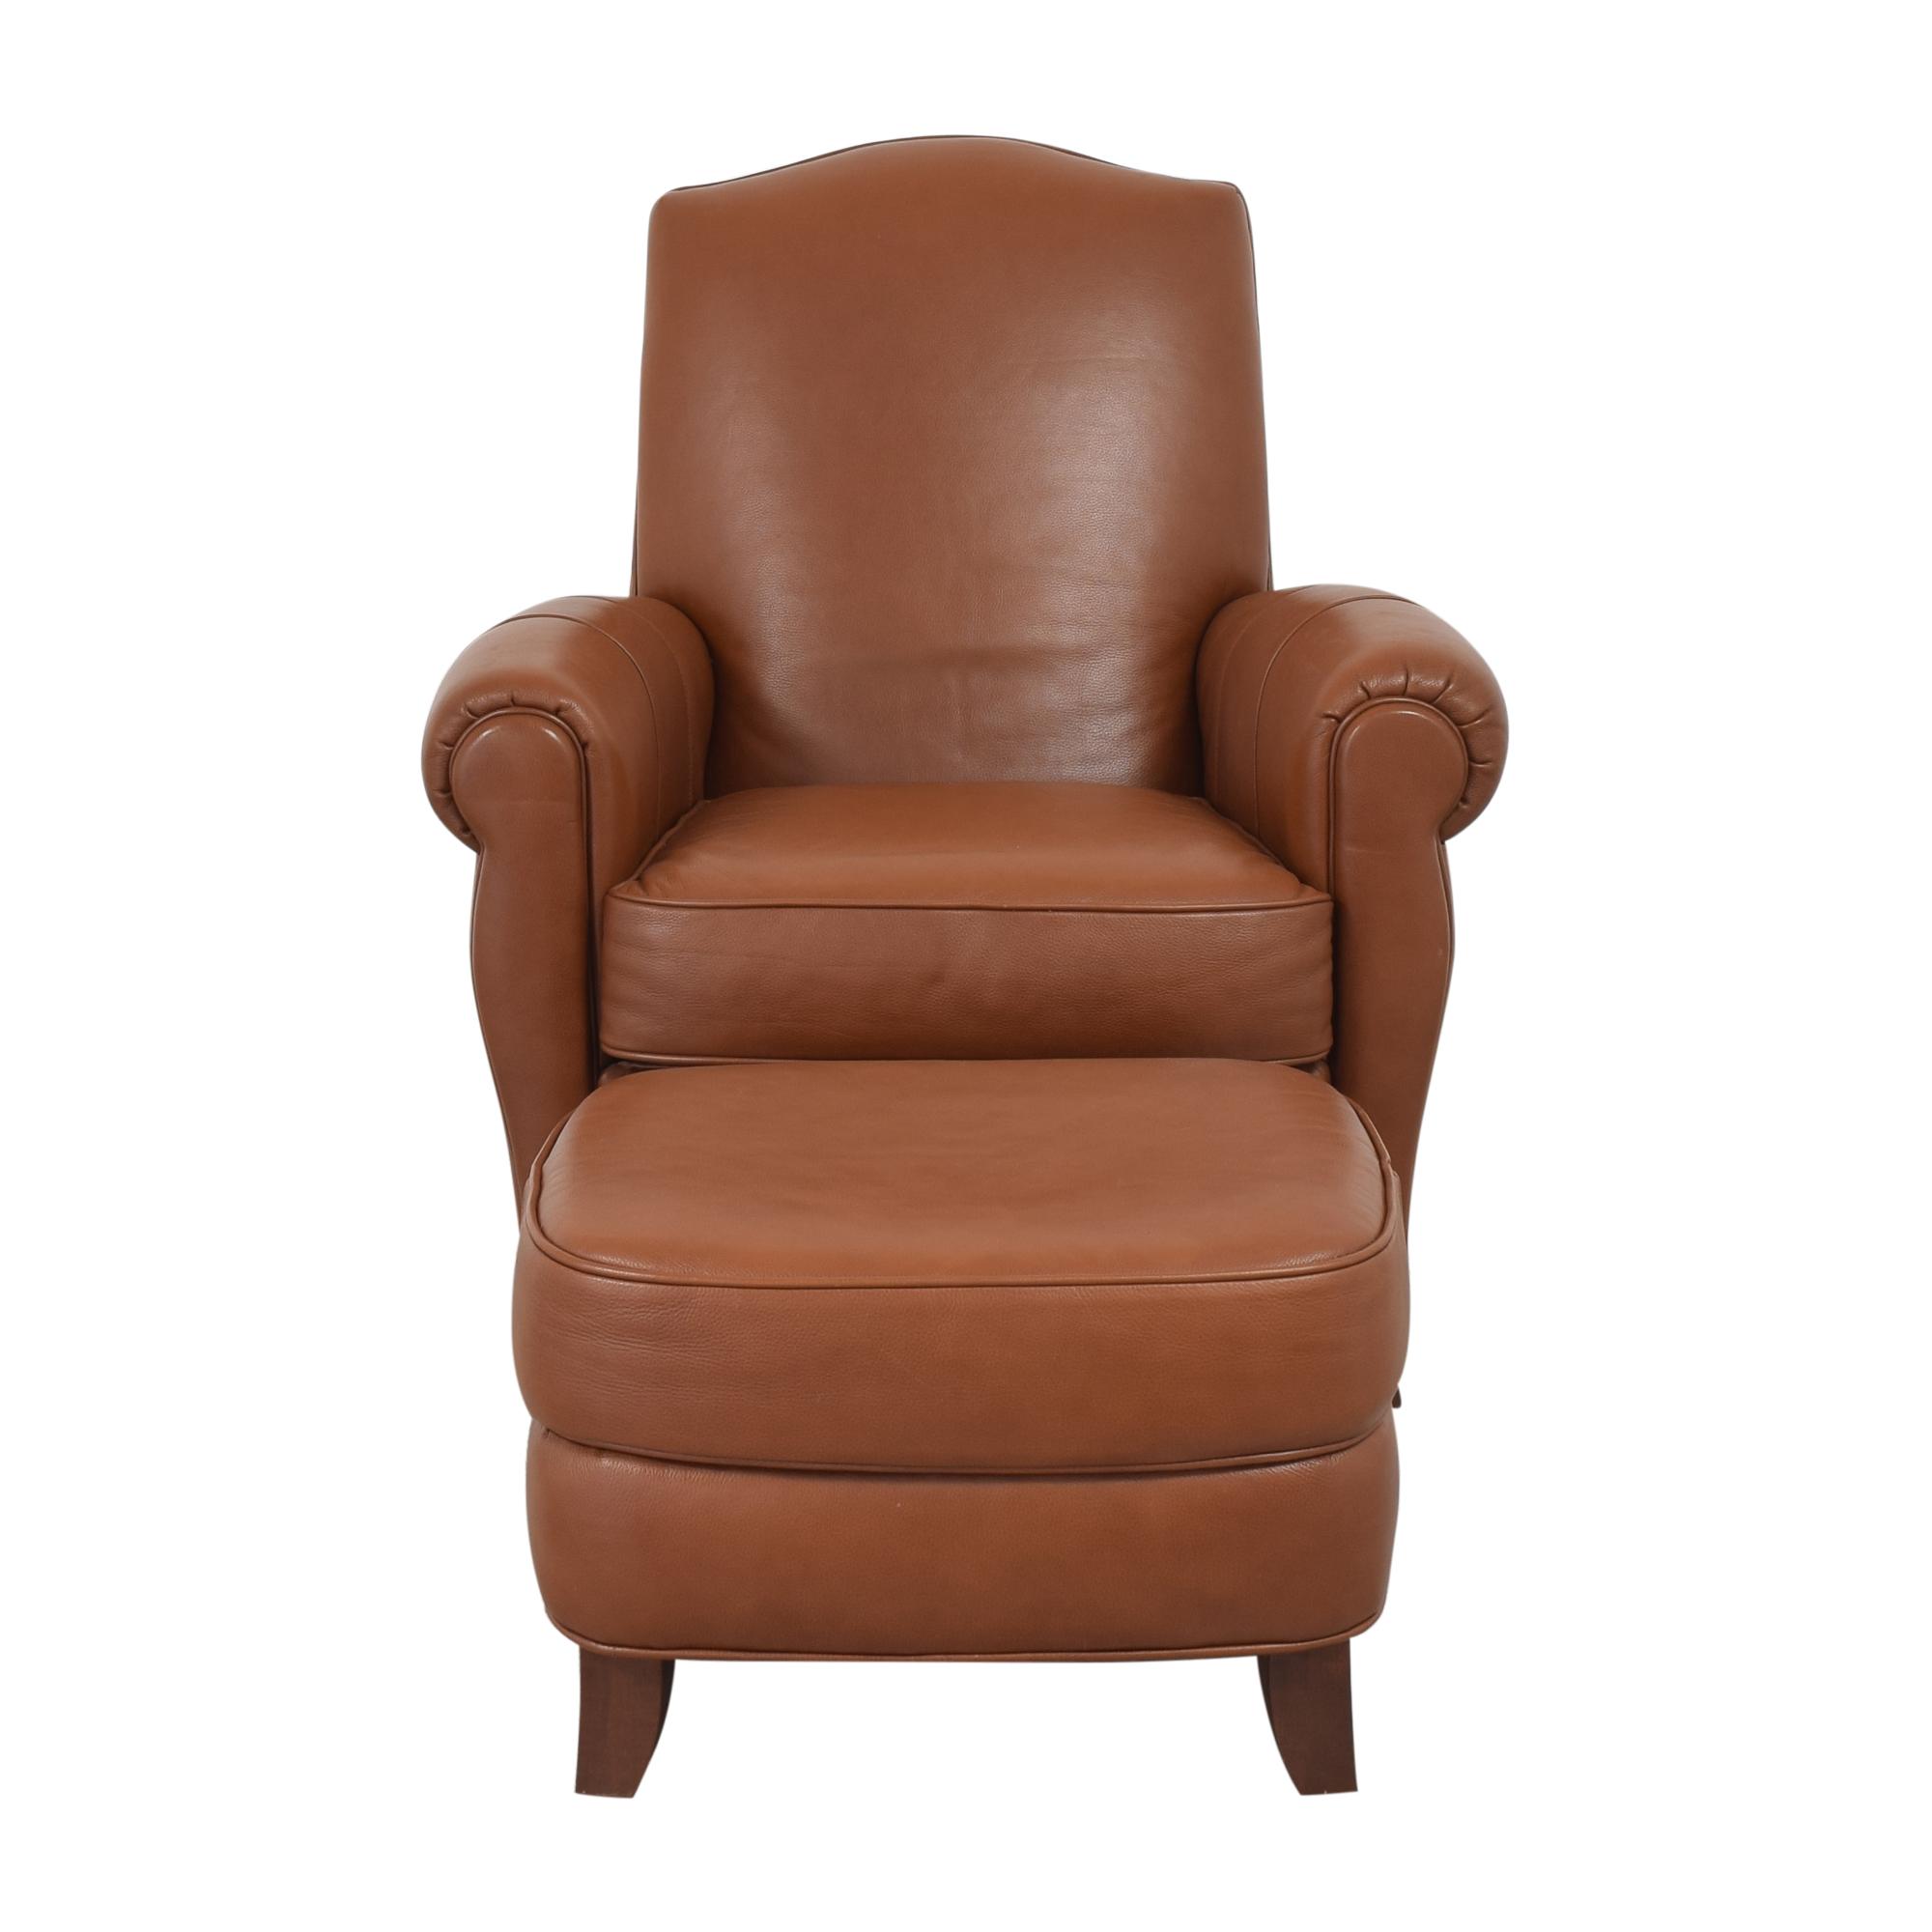 Ethan Allen Ethan Allen Roll Arm Chair with Ottoman brown